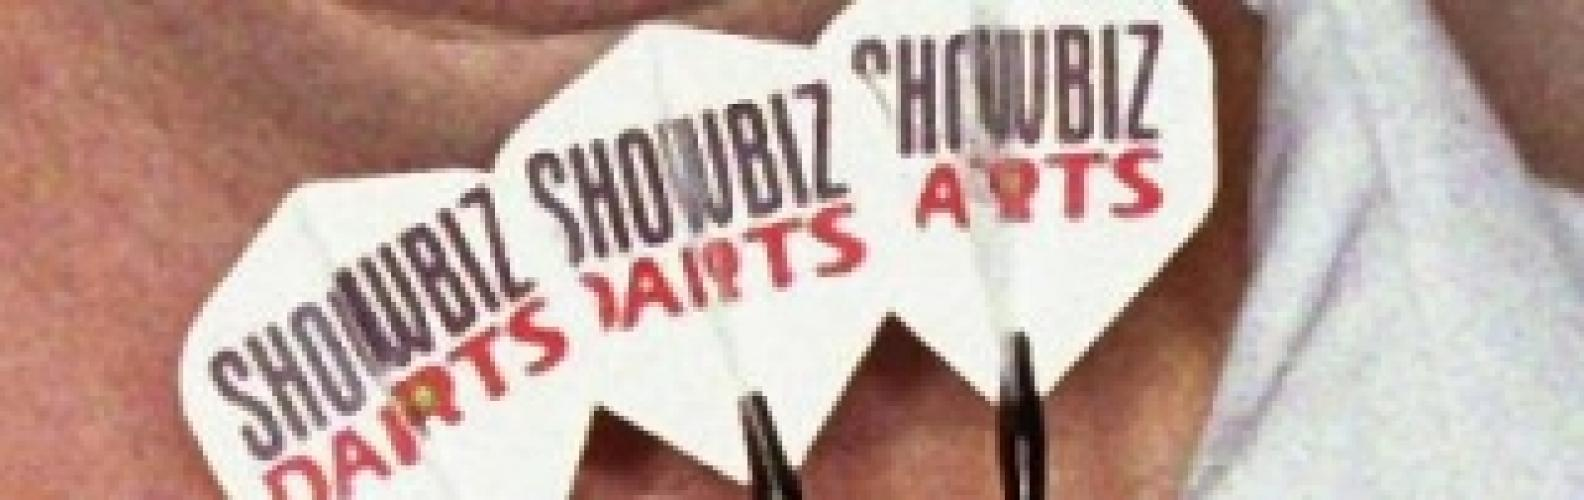 Showbiz Darts next episode air date poster